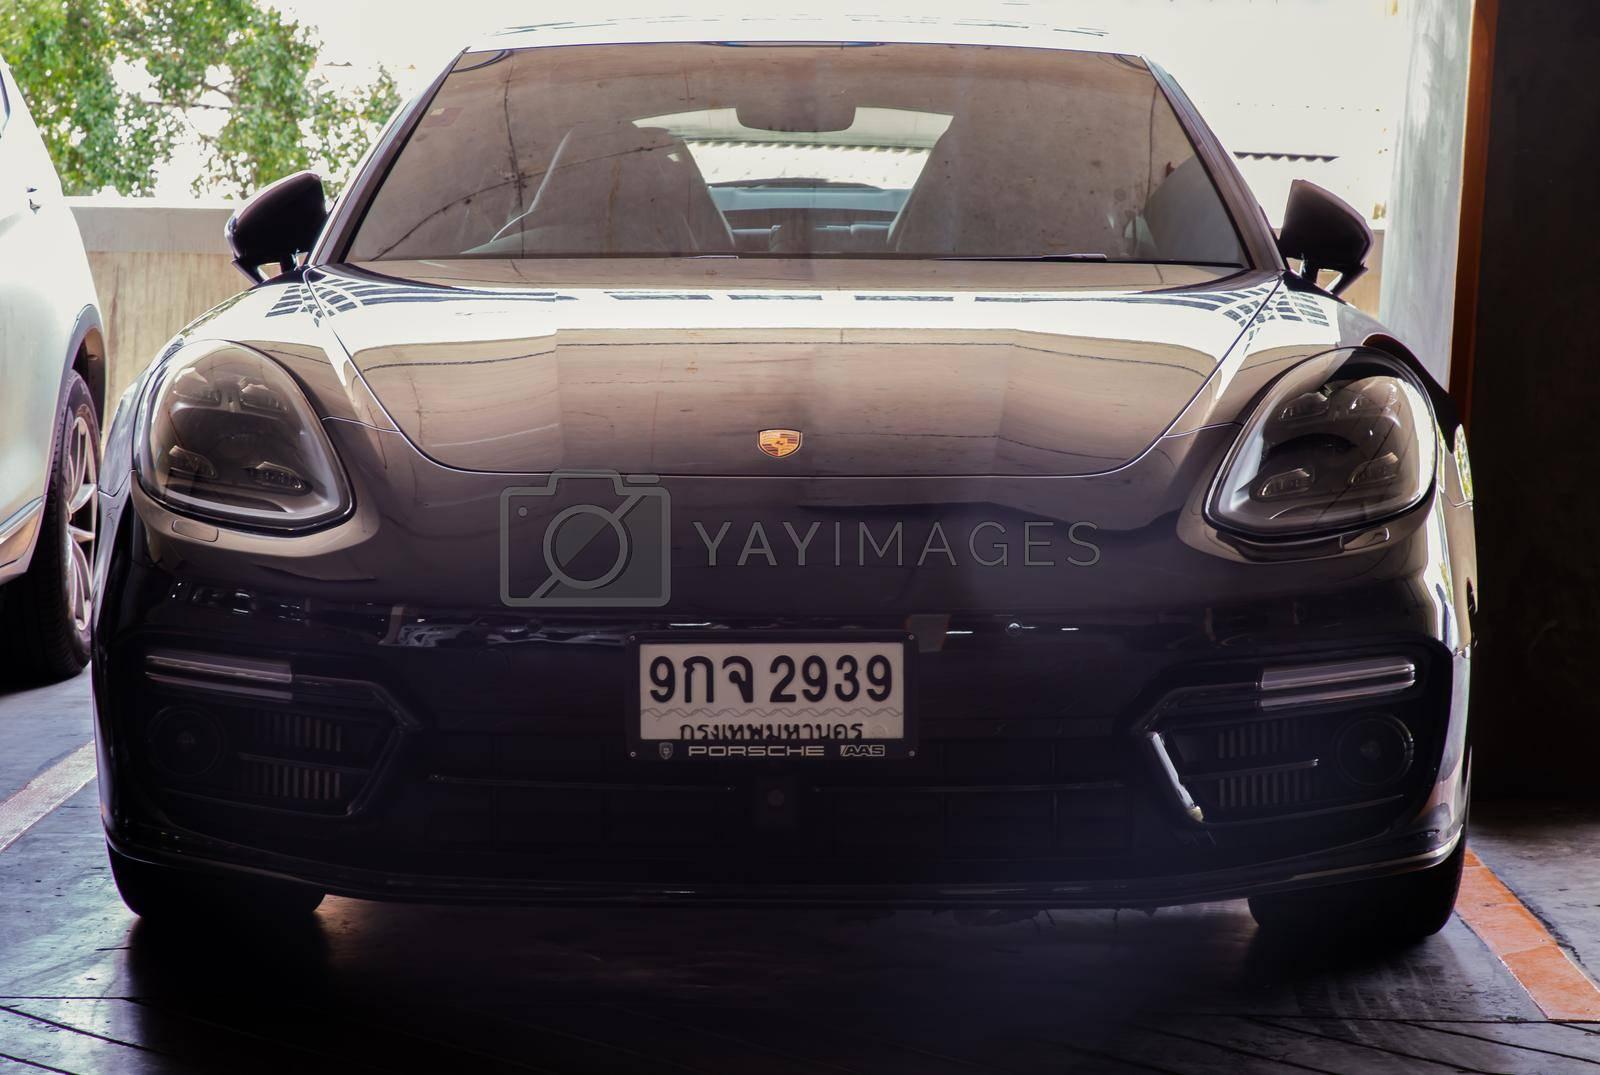 Bangkok, Thailand - 06 Jun 2021 : Front view shot of Black porsche sports car parked in the parking lot. Selective focus.